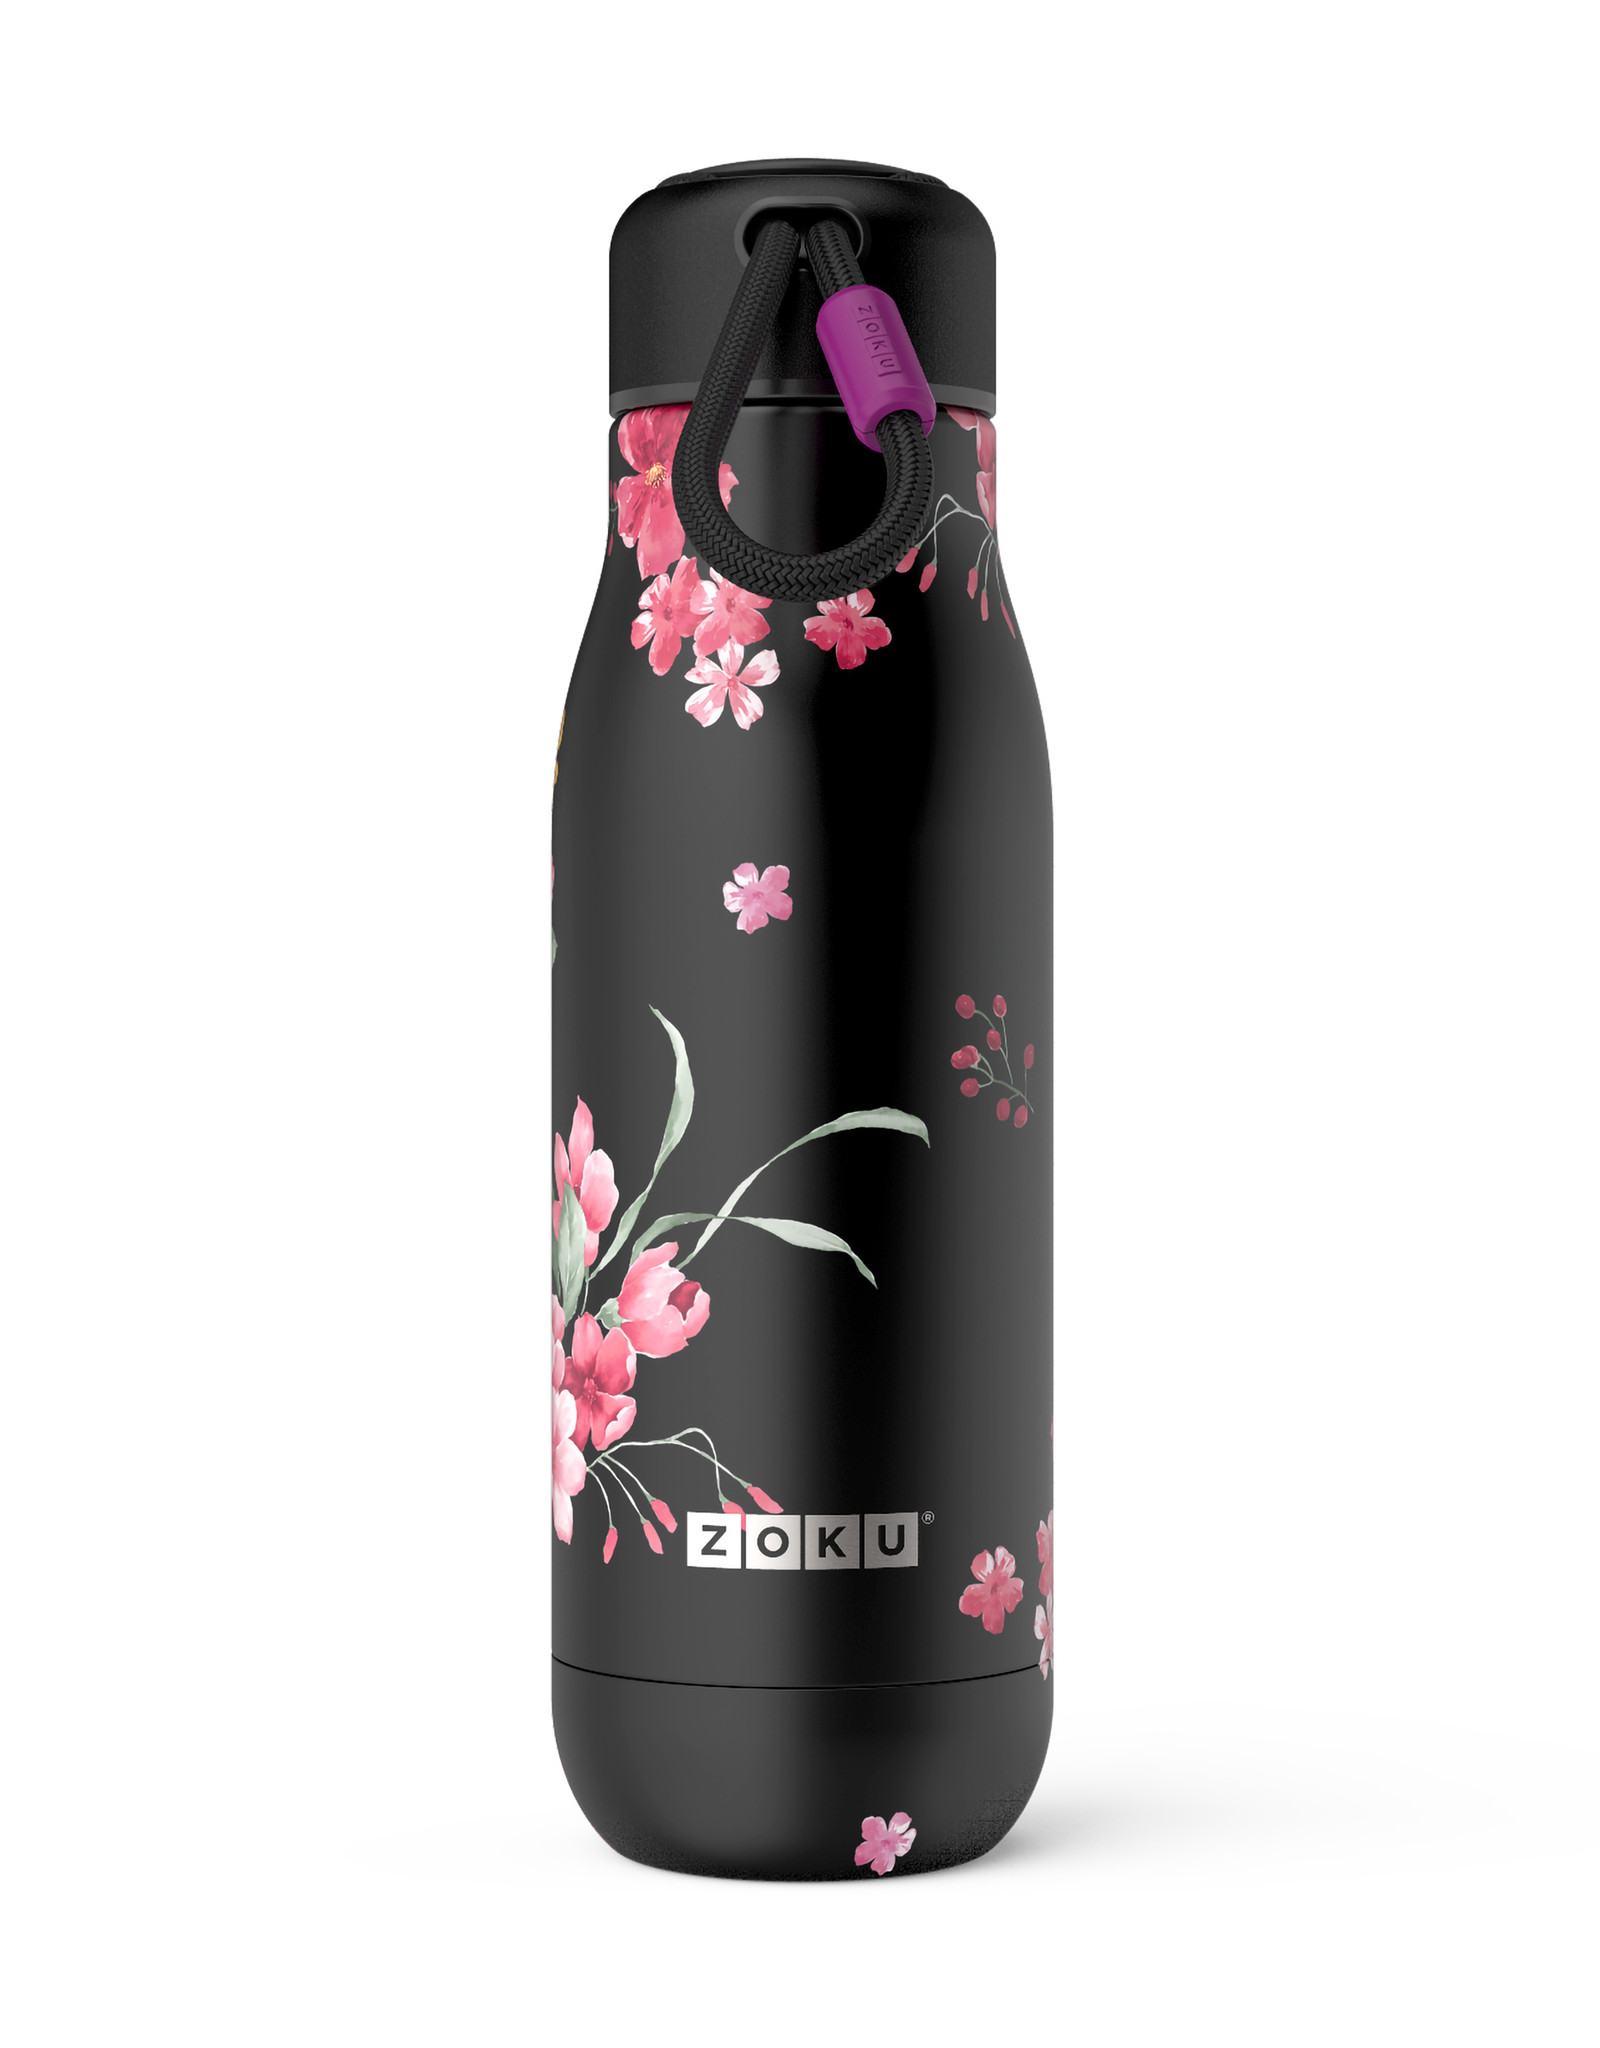 Zoku RVS drinkbeker - Midnight floral 500 ml